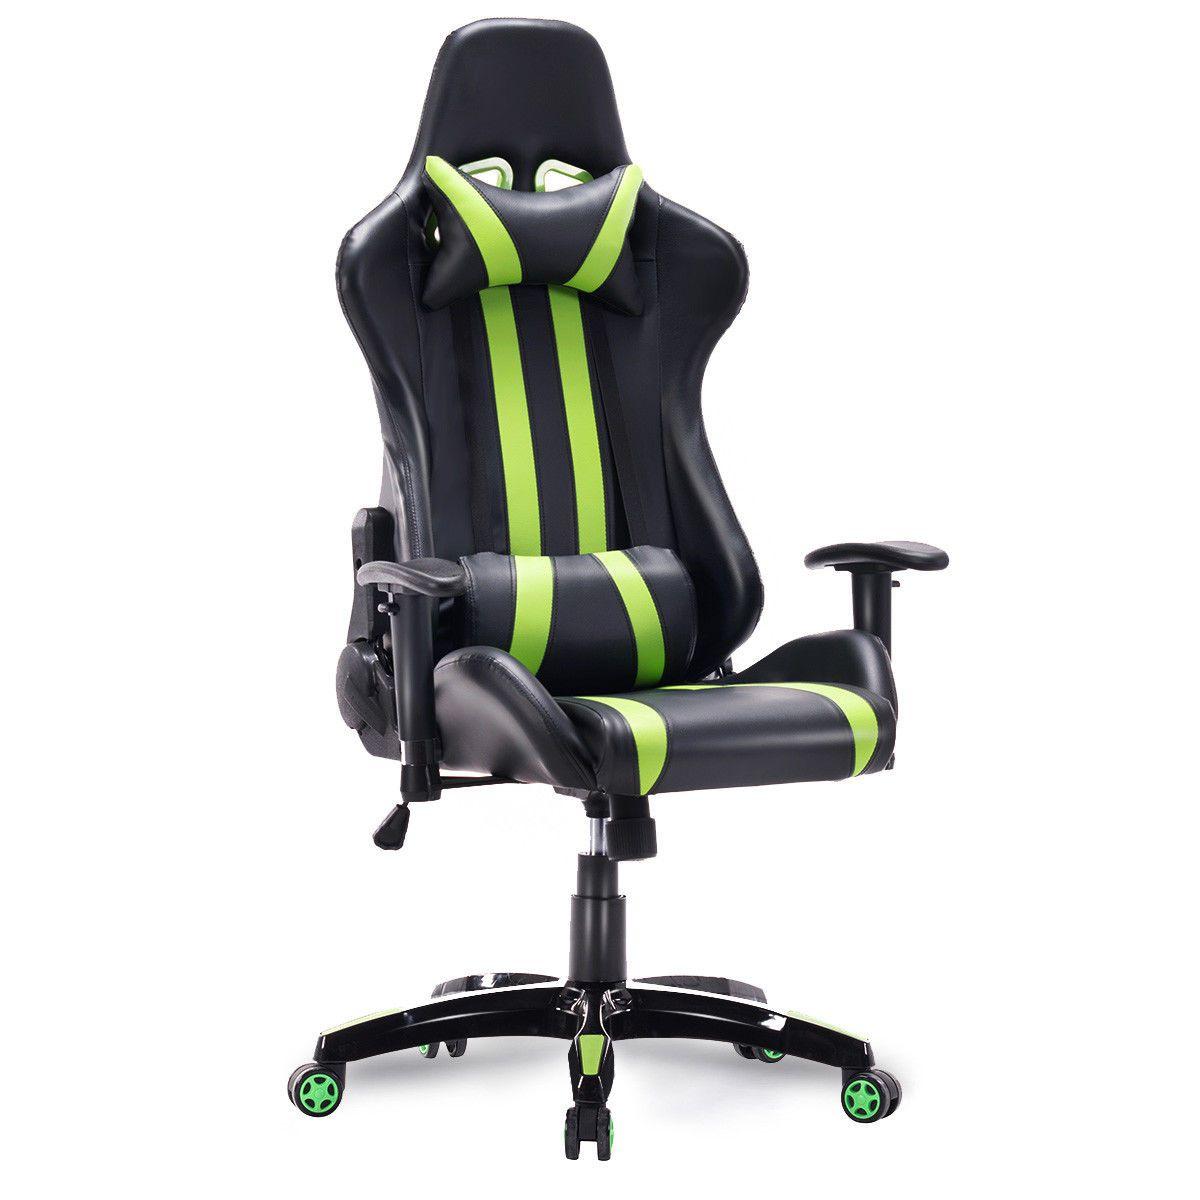 Black & Green Stripes High Back Executive Sports Car Gaming Chair